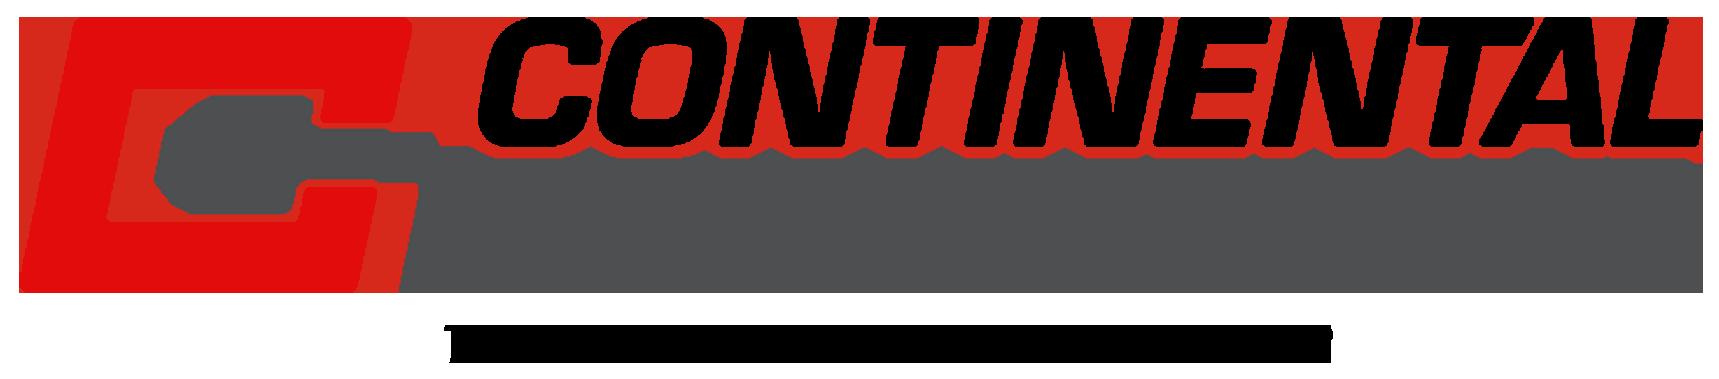 PER111996361